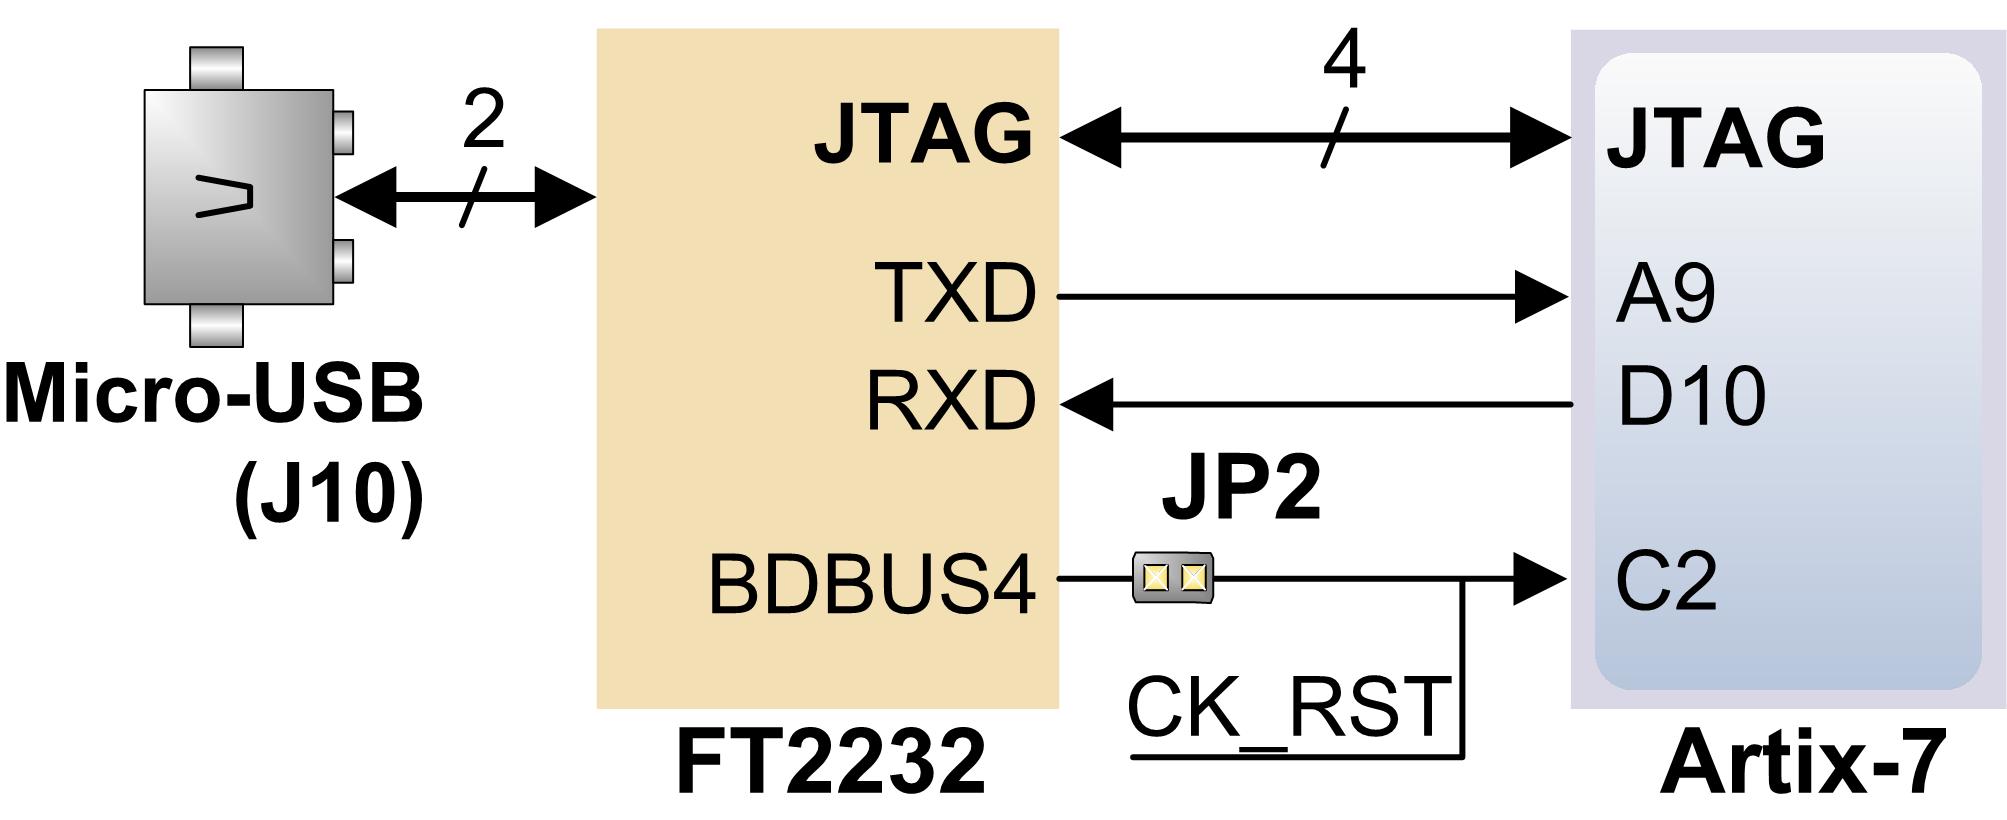 Figure 8.1. UART.